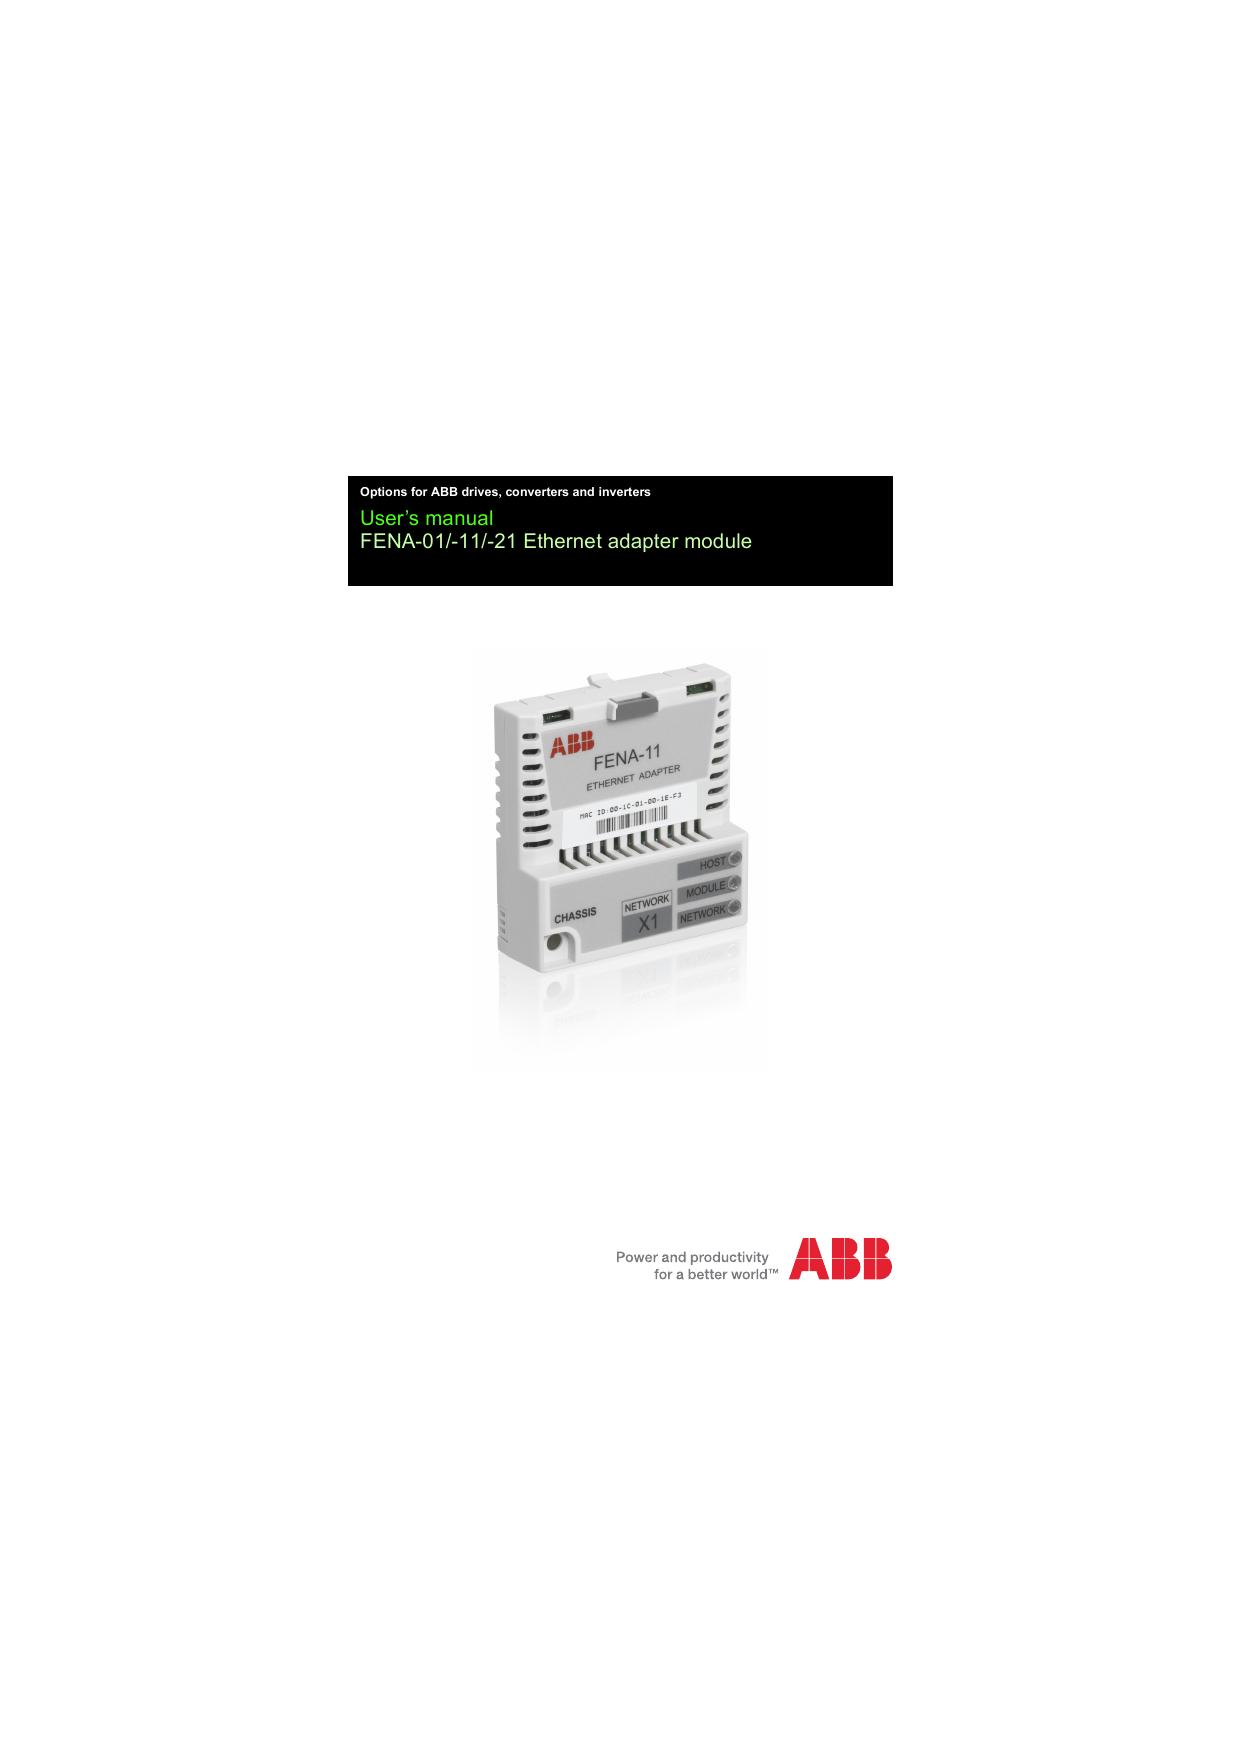 FENA-01/-11/-21 Ethernet adapter module user`s manual